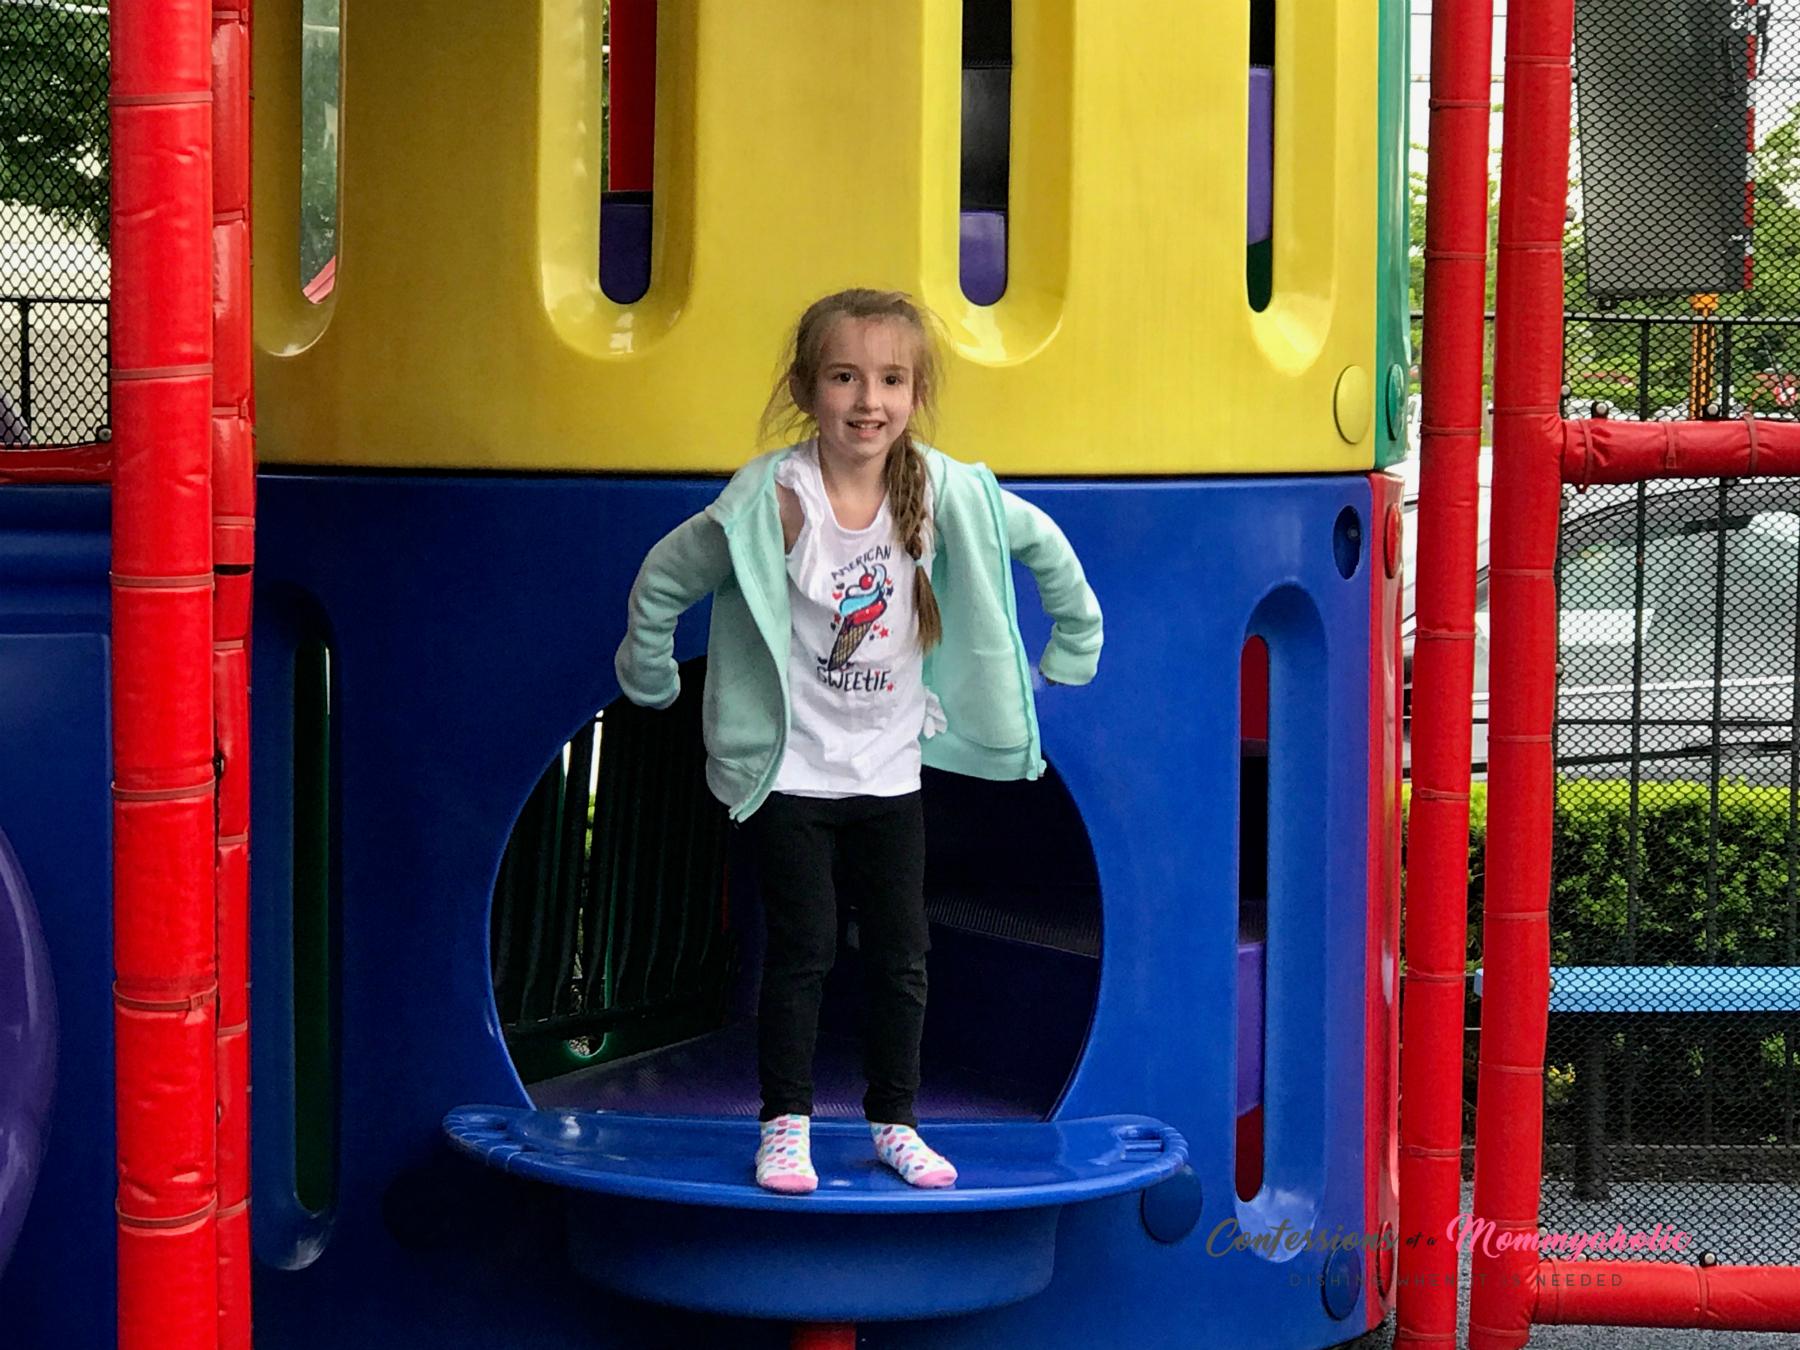 Having fun on McDonald's Playground